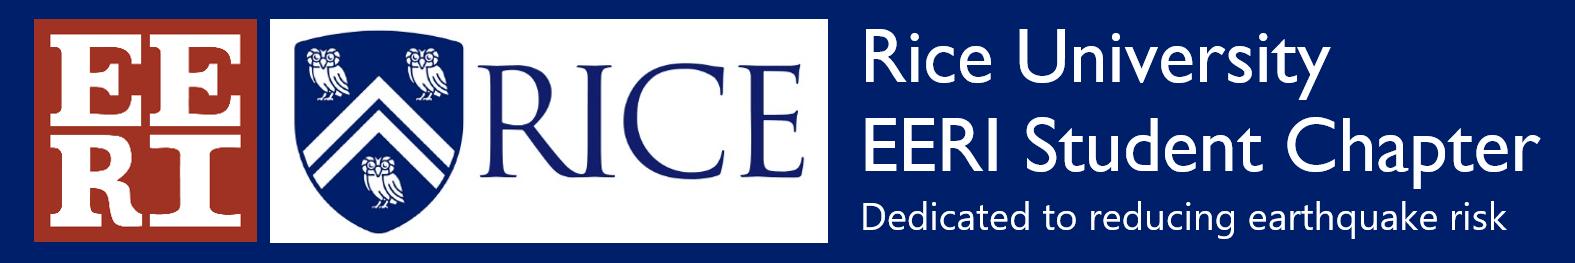 Rice University EERI Student Chapter